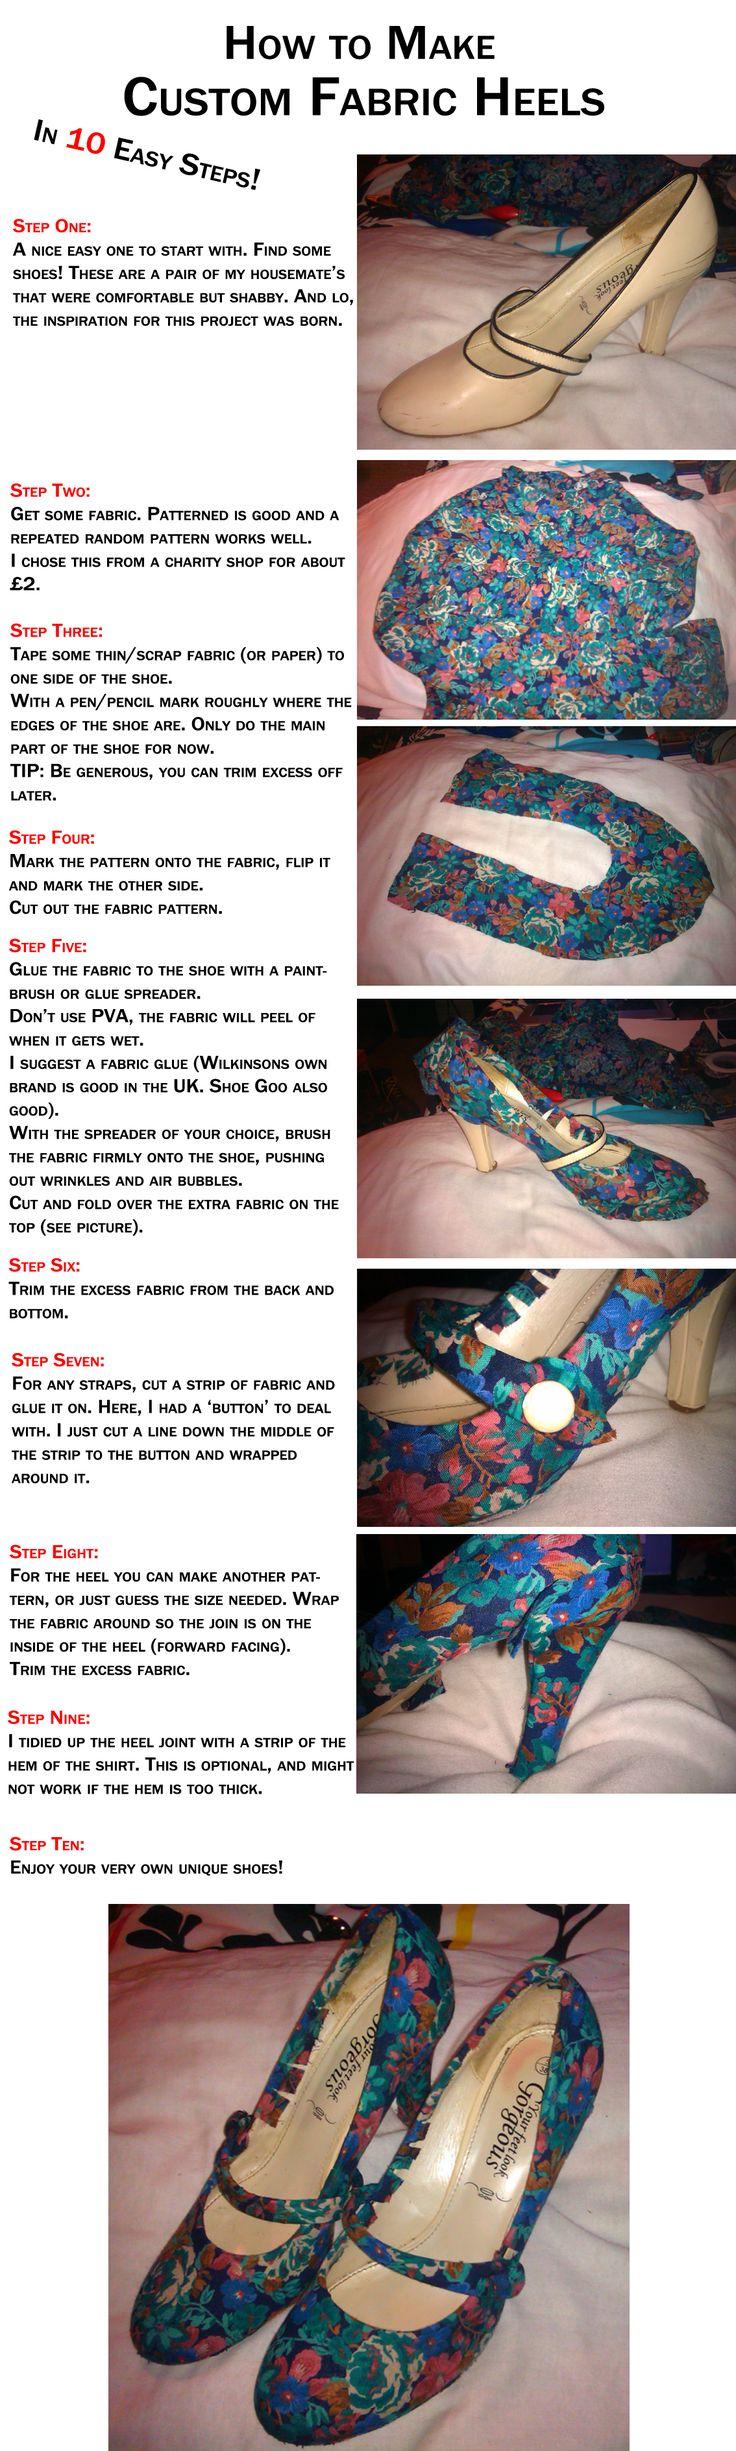 How to Make: Custom Fabric Heels by ~GAME-OVER-CUSTOM on deviantART